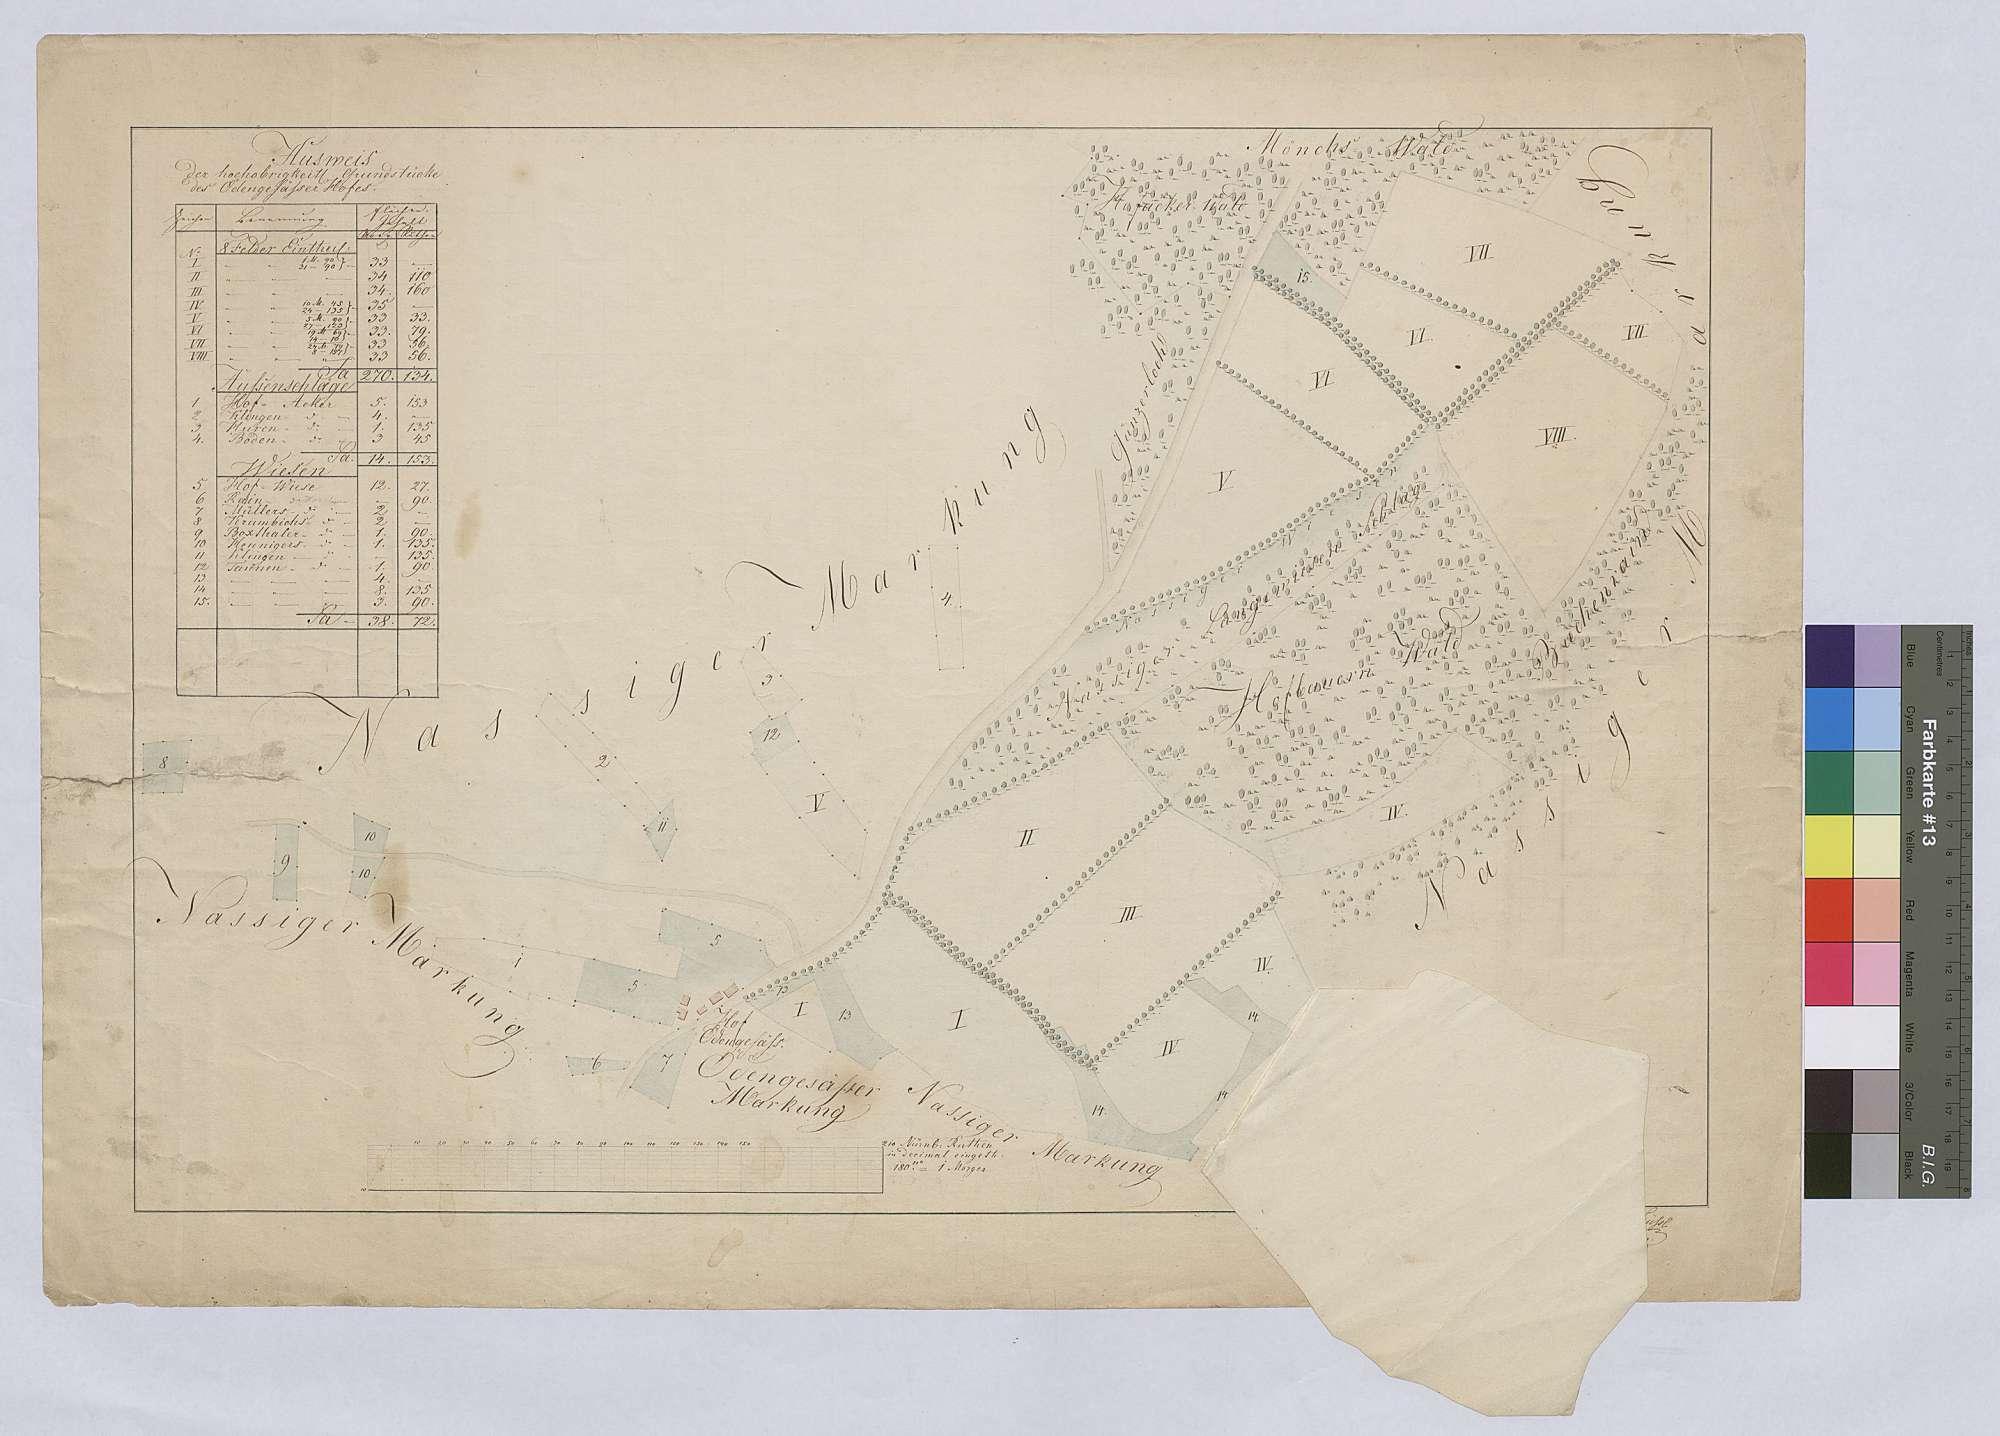 Grundstücke des Ödengesäßer Hofes (Inselkarte), b